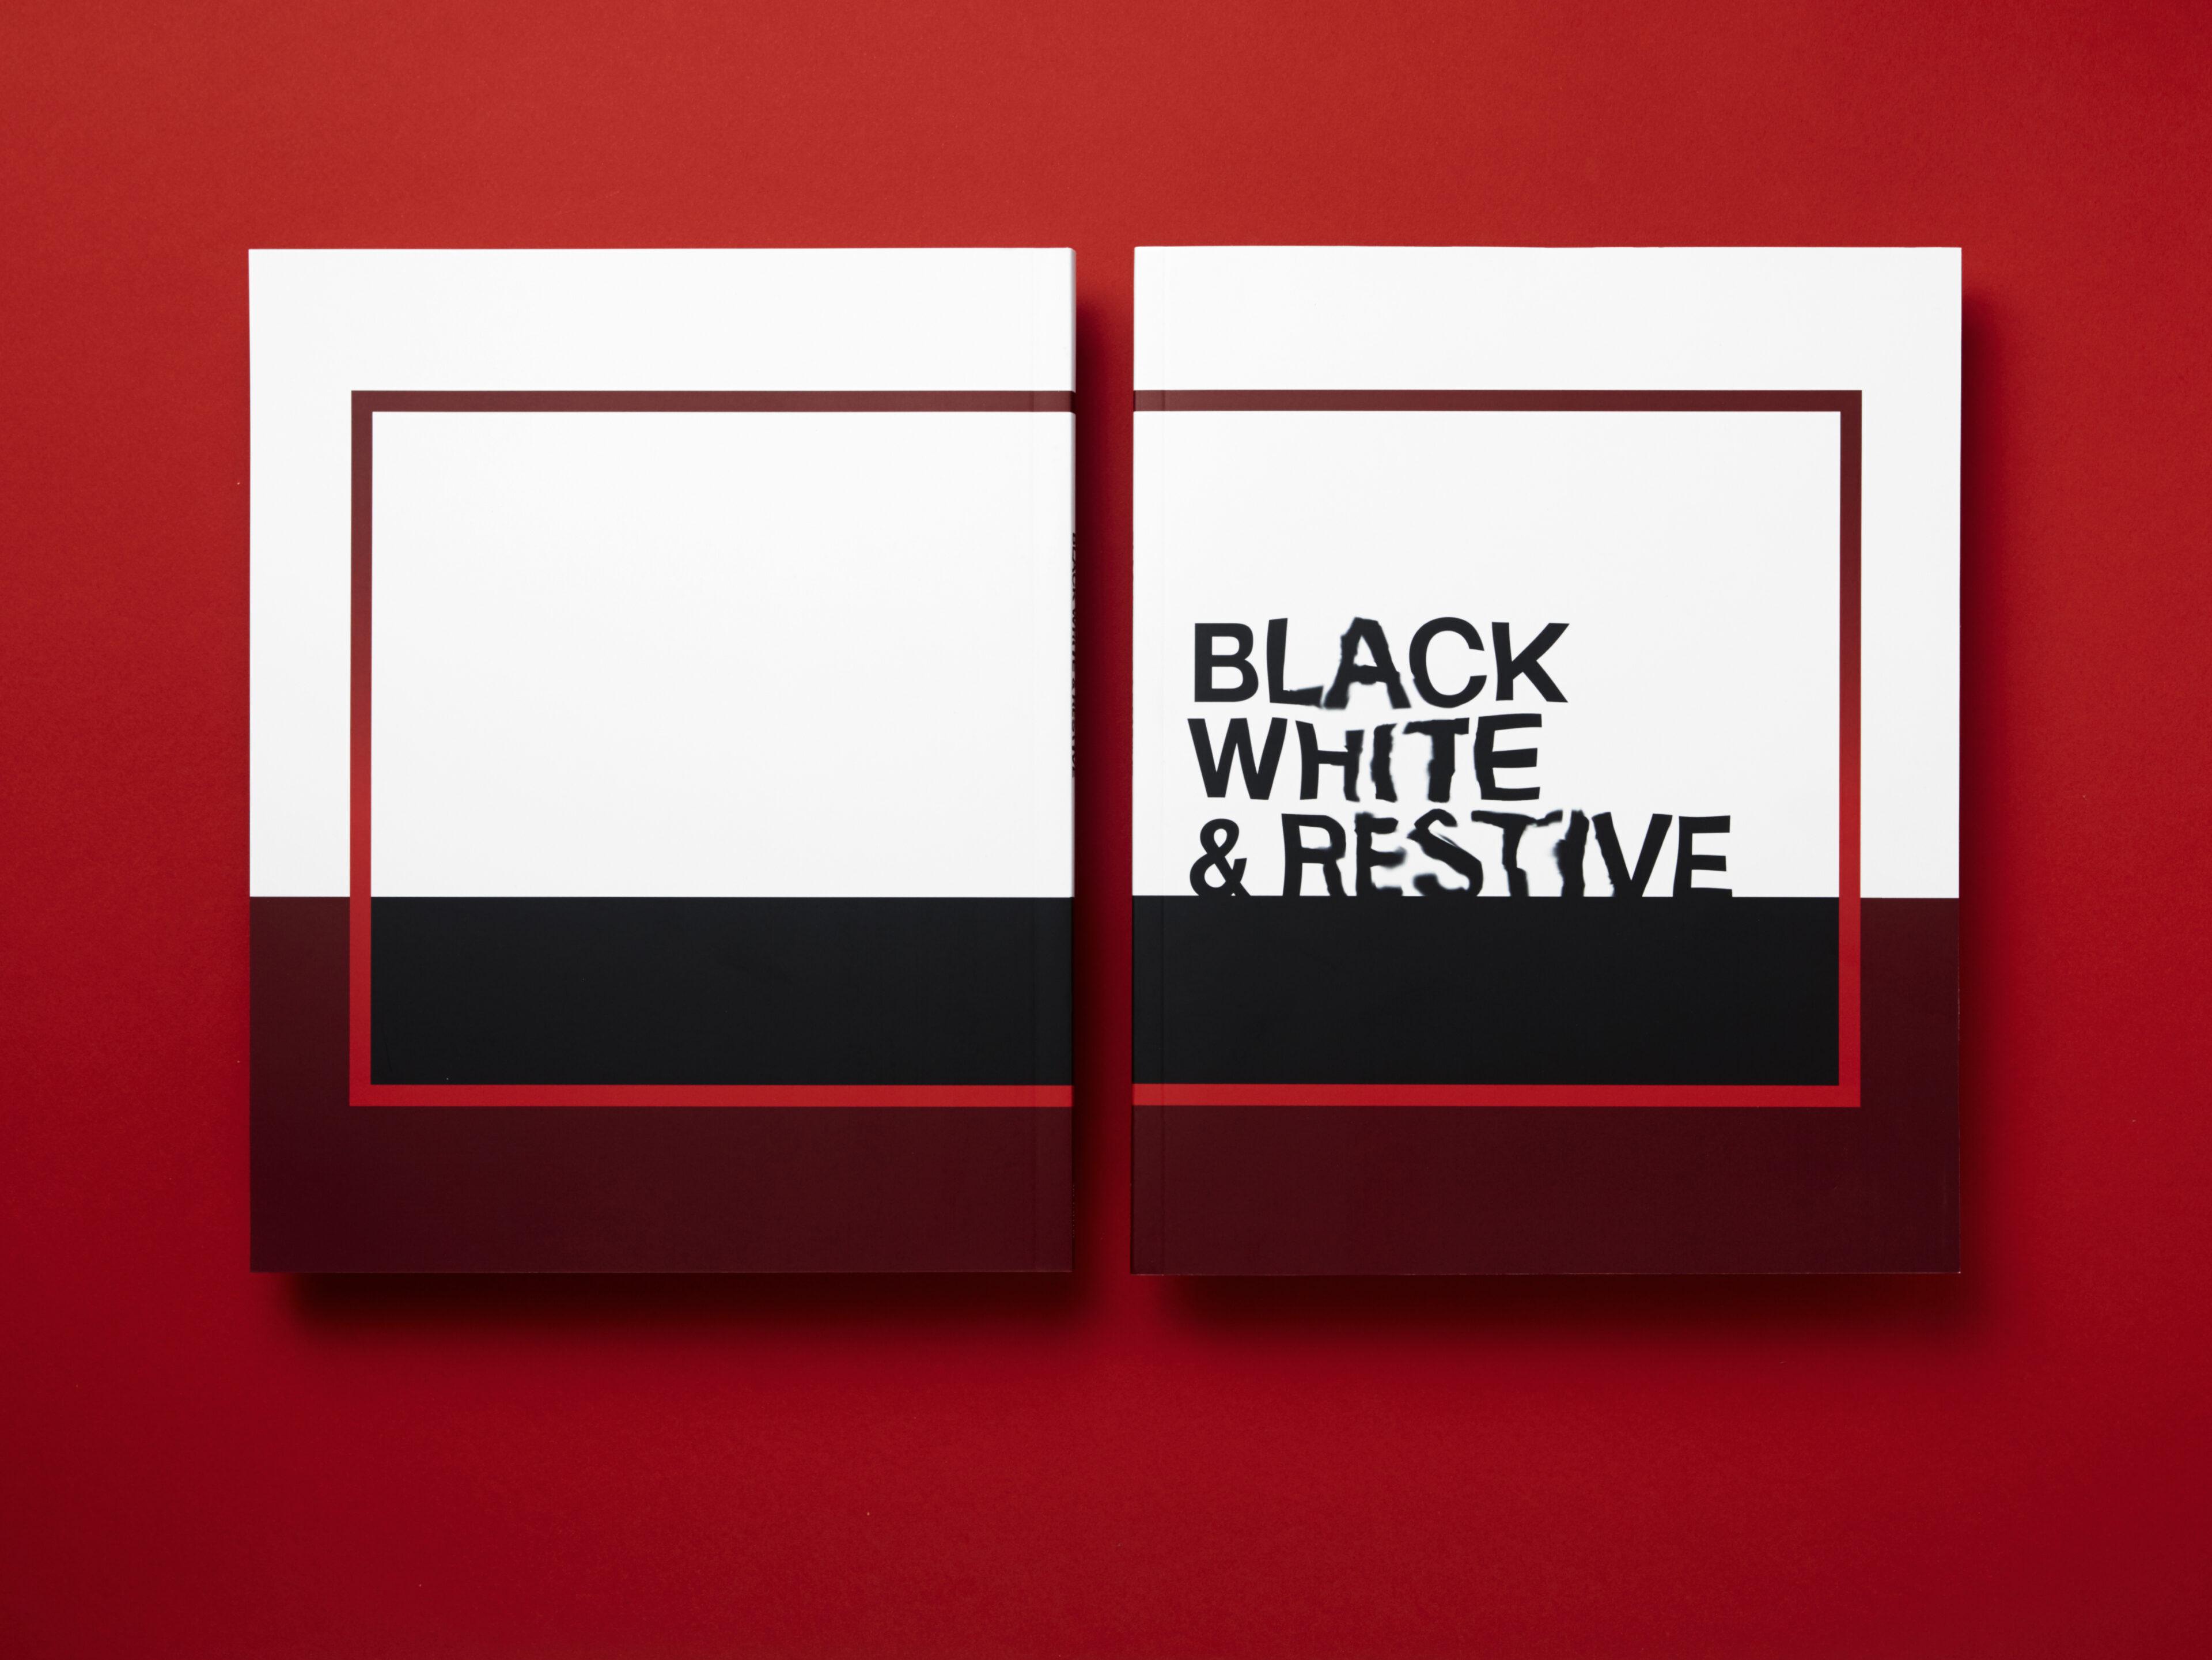 Headjam black white restive 7